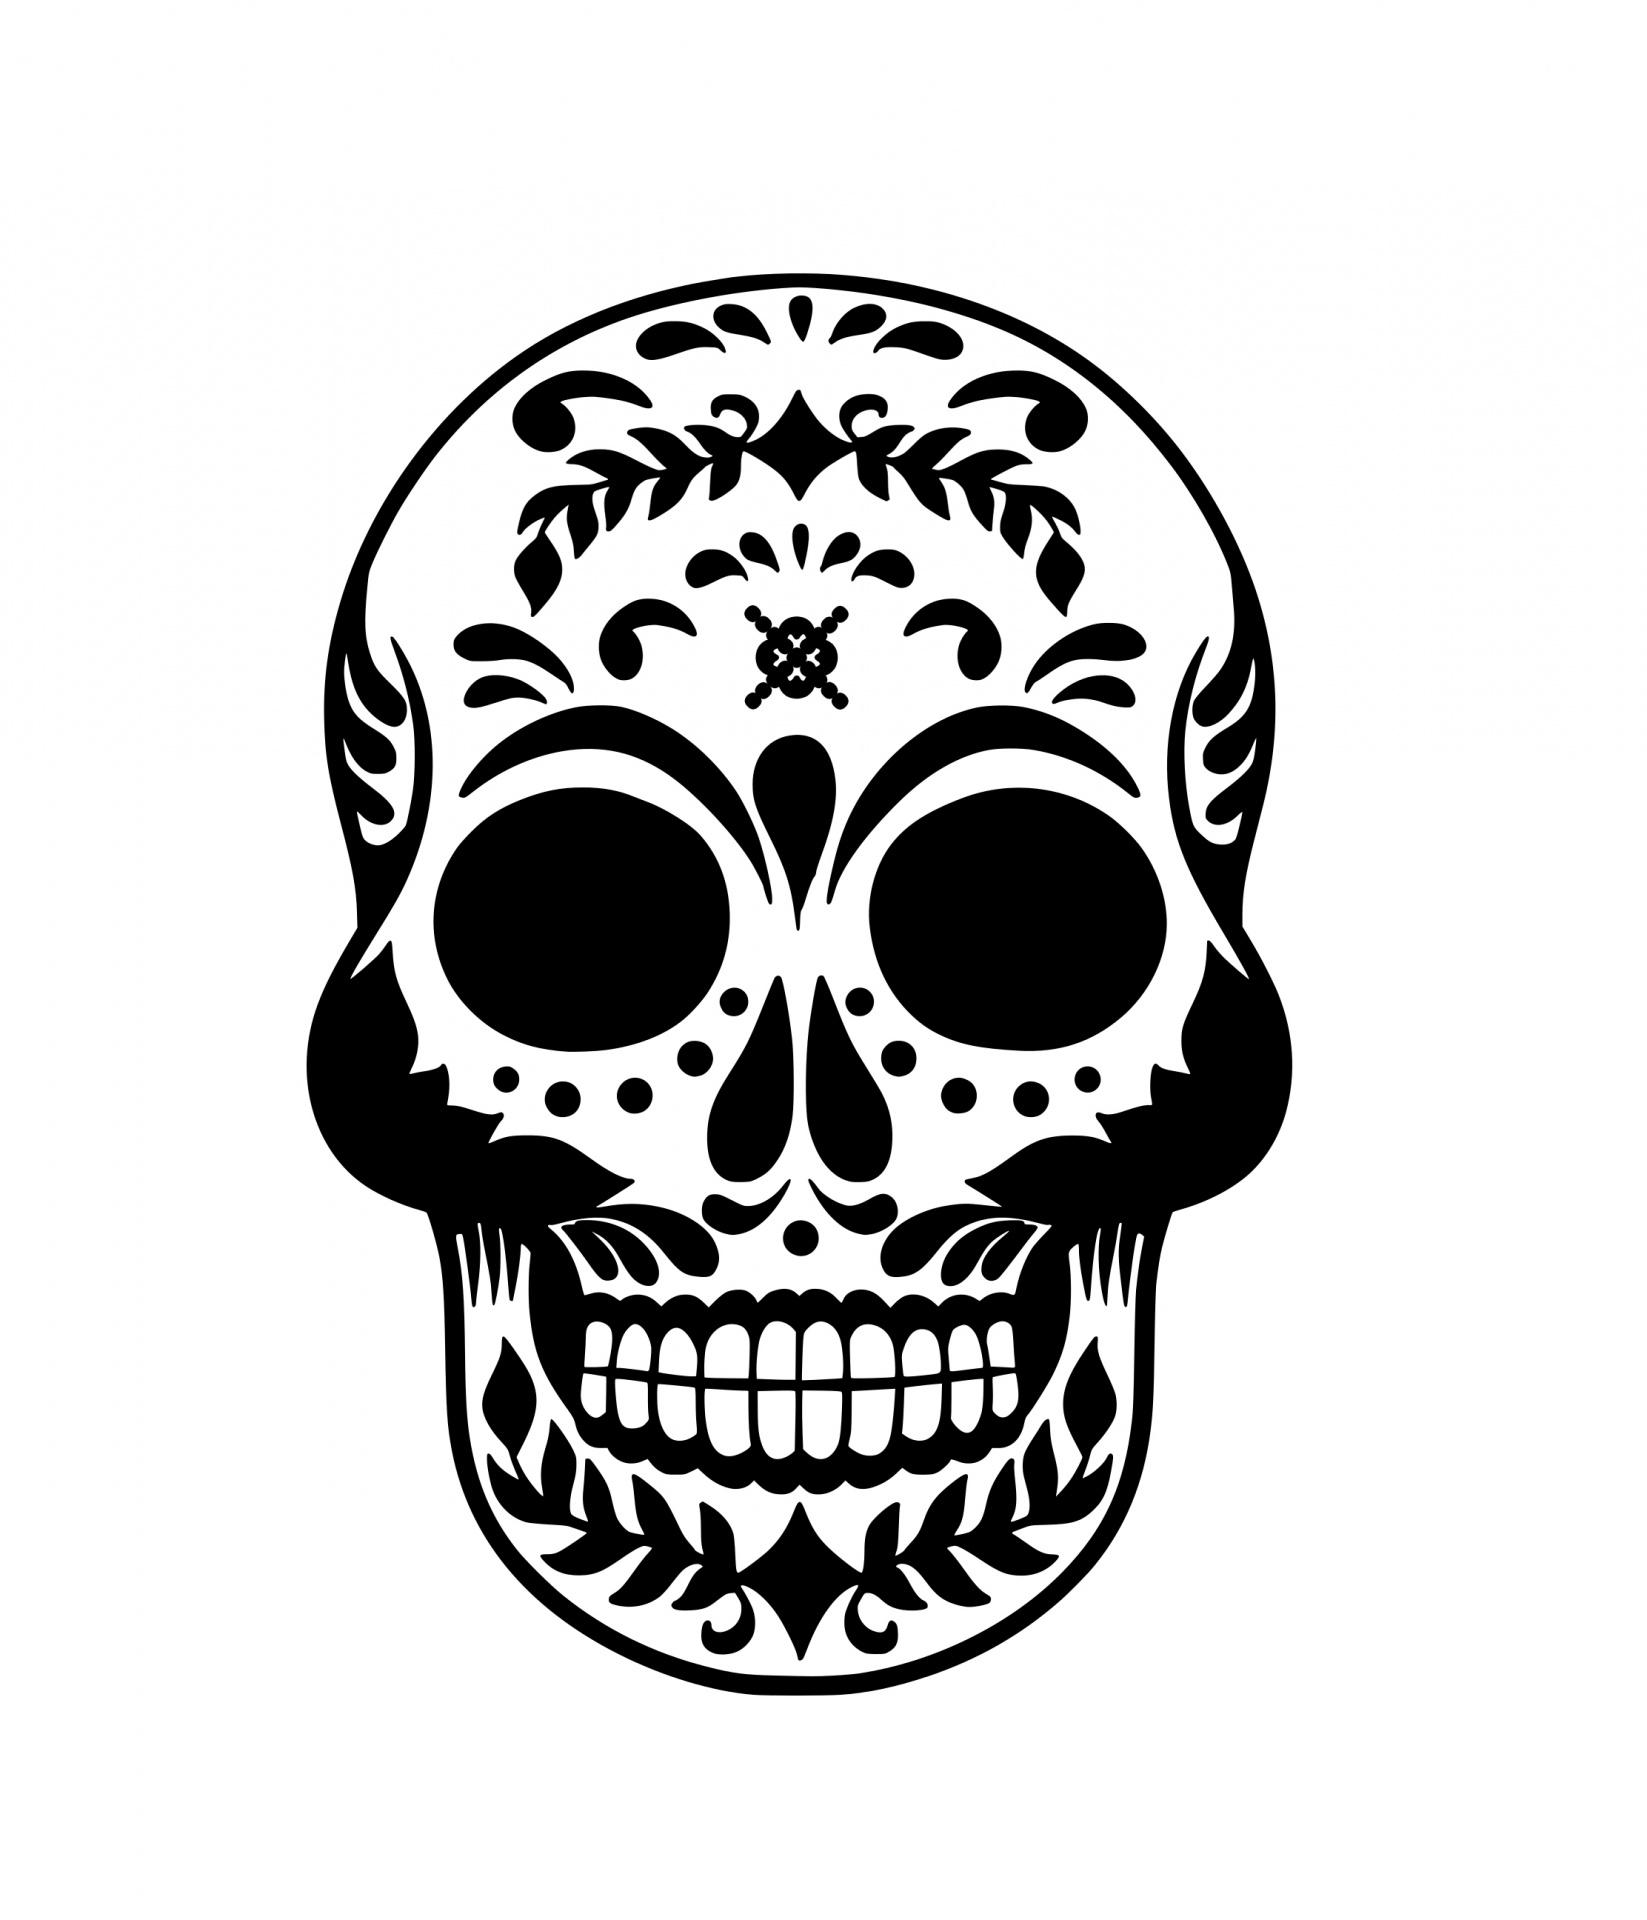 Skull Halloween Clipart Free Stock Photo